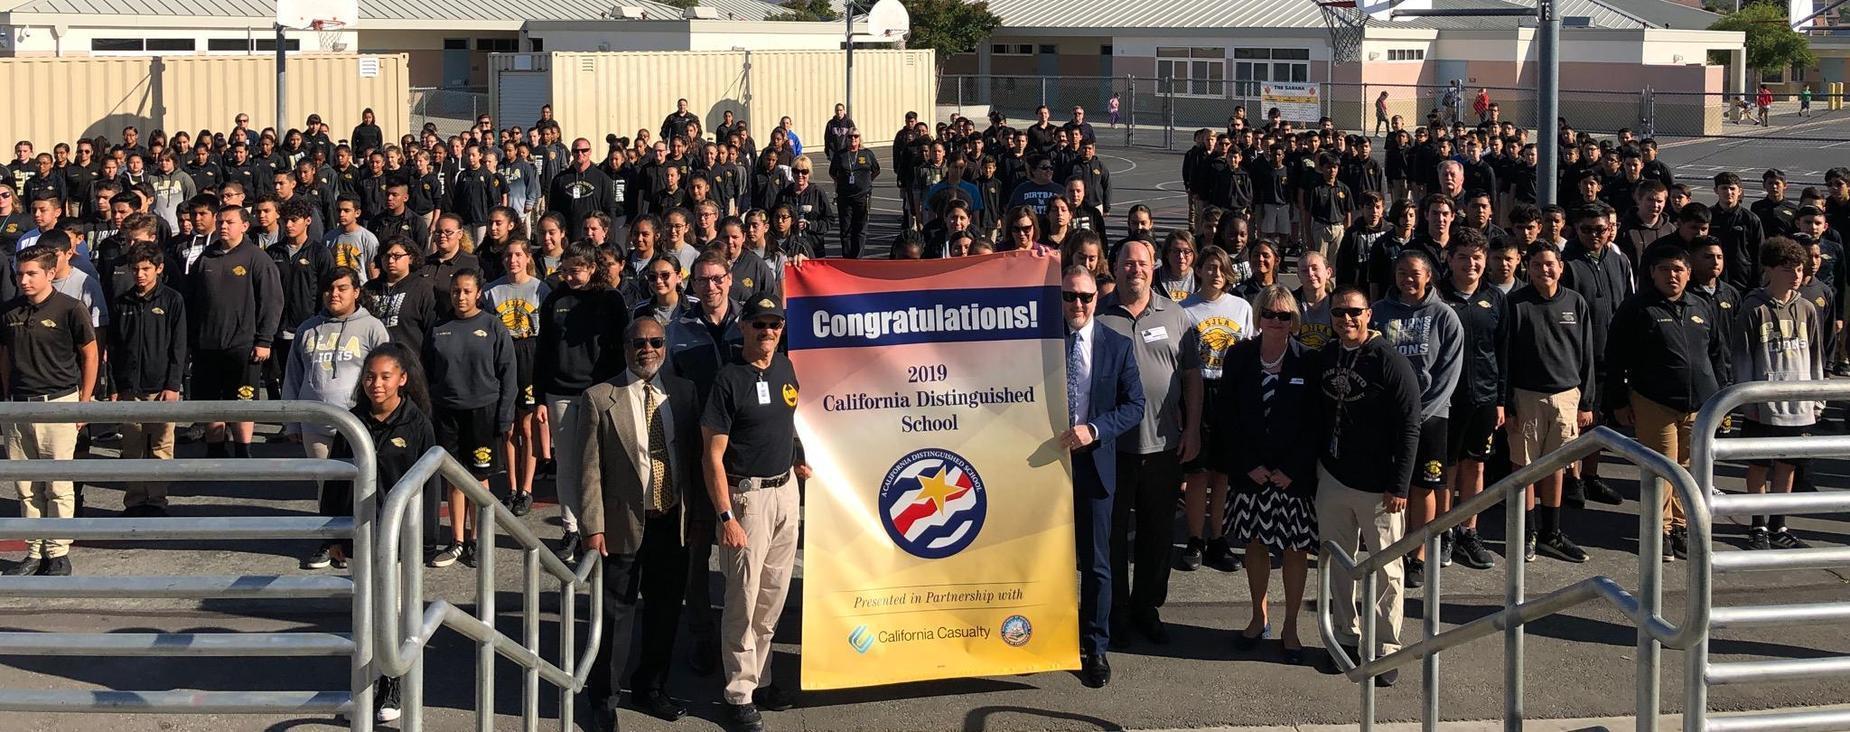 SJLA - A California Distinguisehd School